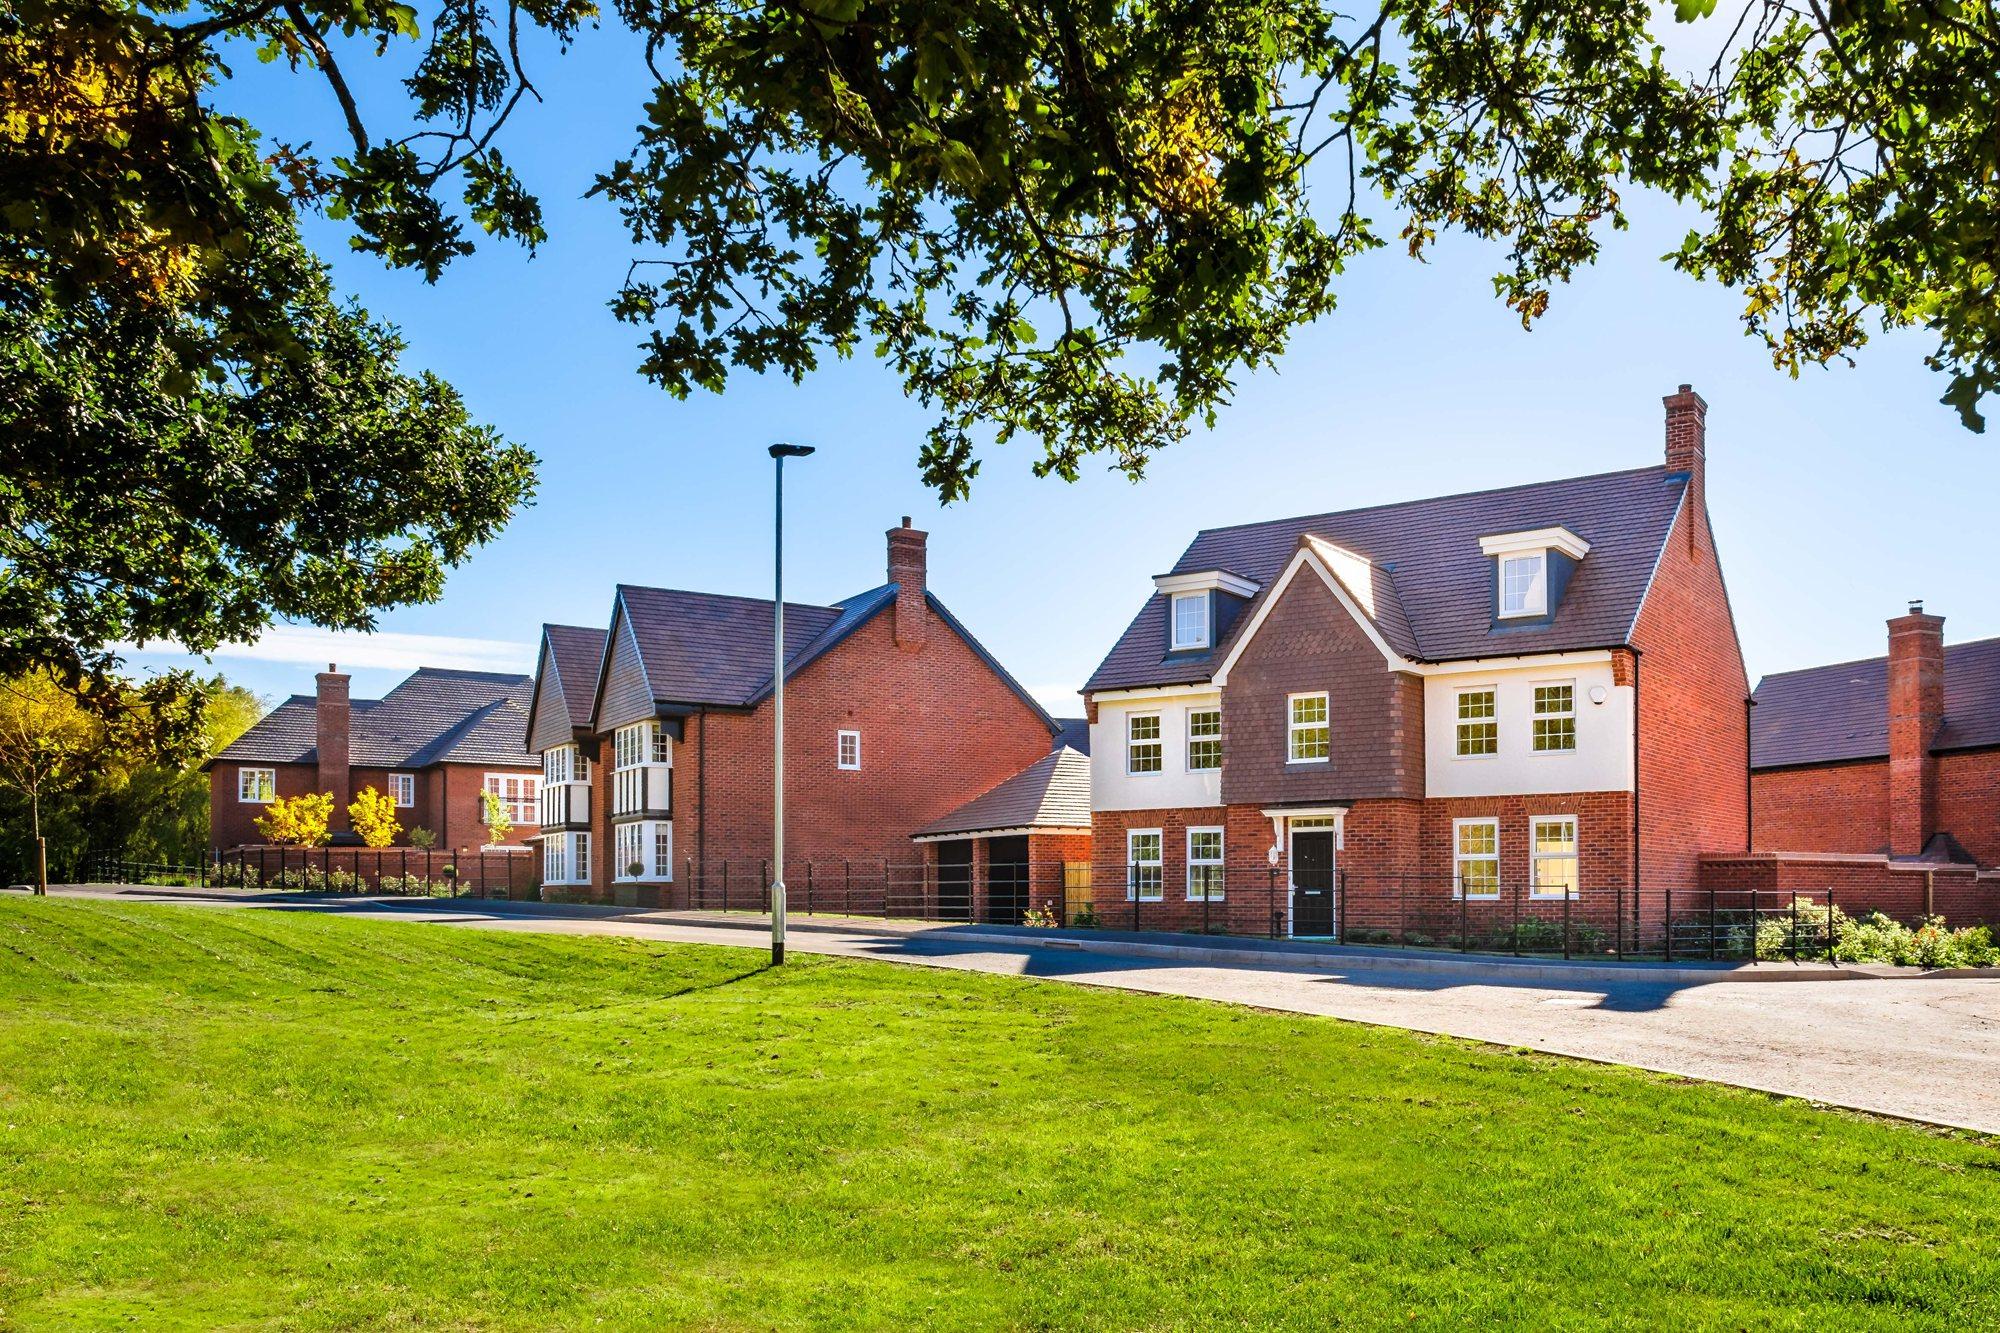 New Build Homes in Barlaston